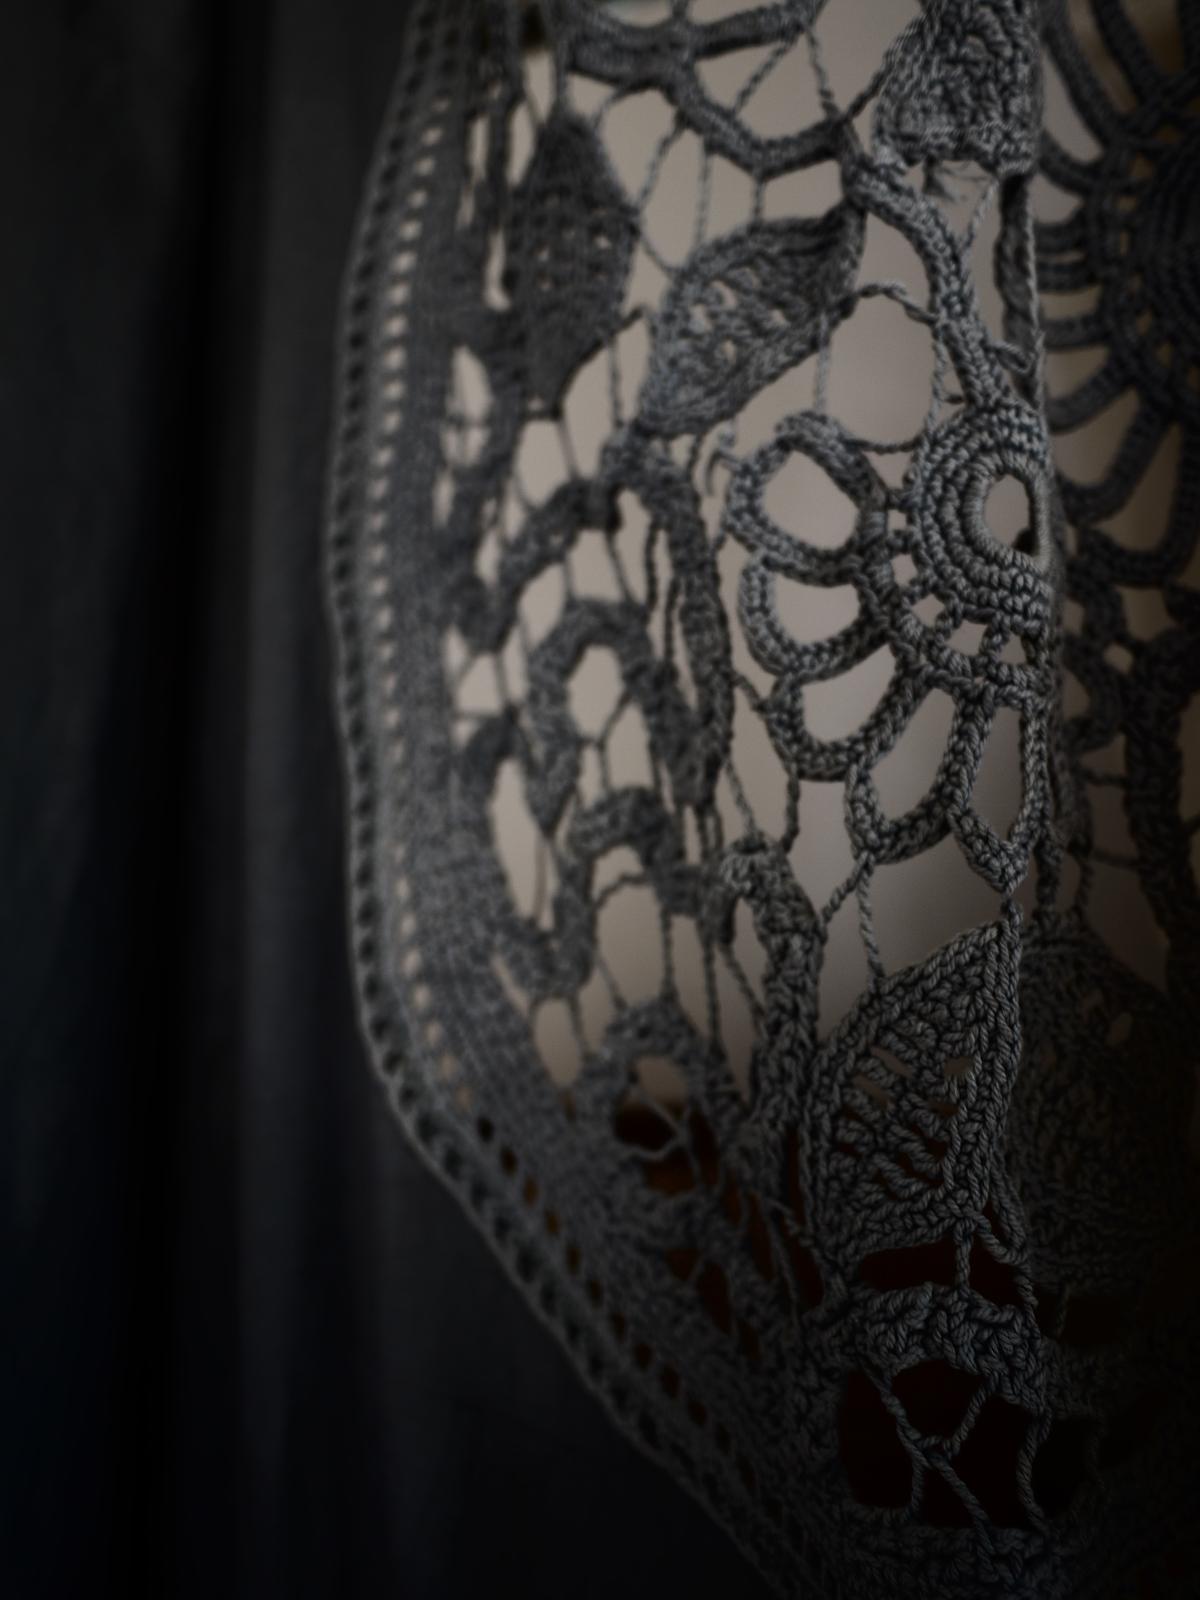 Bracelets LOOM - Design textile by Myriam Balaÿ myriam-balay-cherie-cherie CHERIE CHERIE L'appartement